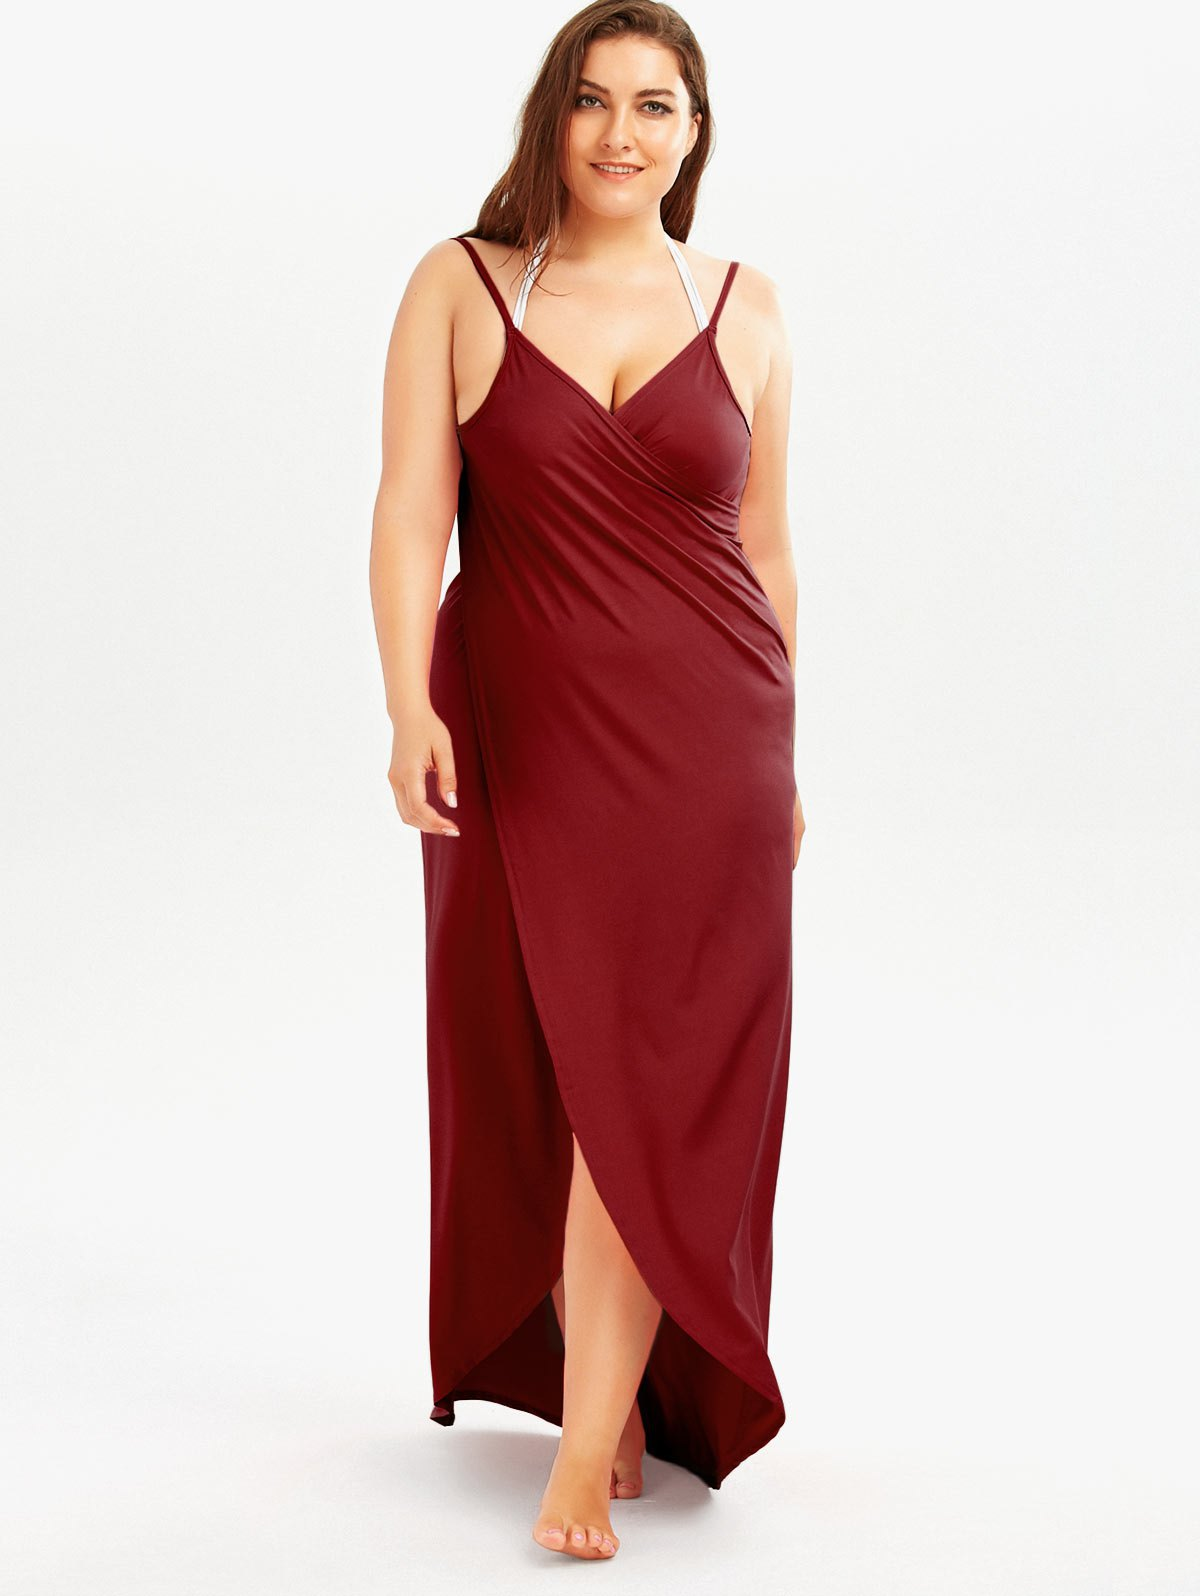 Womens Summer Dresses Short Sleeve Casual Shirt Mini Dress With Pockets